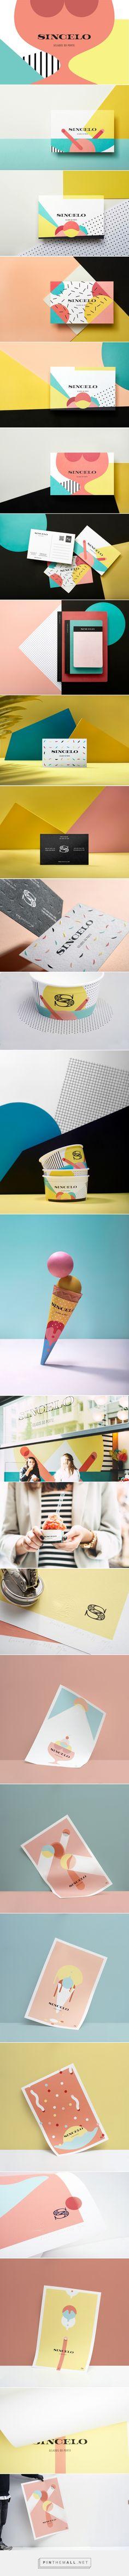 Sincelo Branding on Behance   Fivestar Branding – Design and Branding Agency & Inspiration Gallery